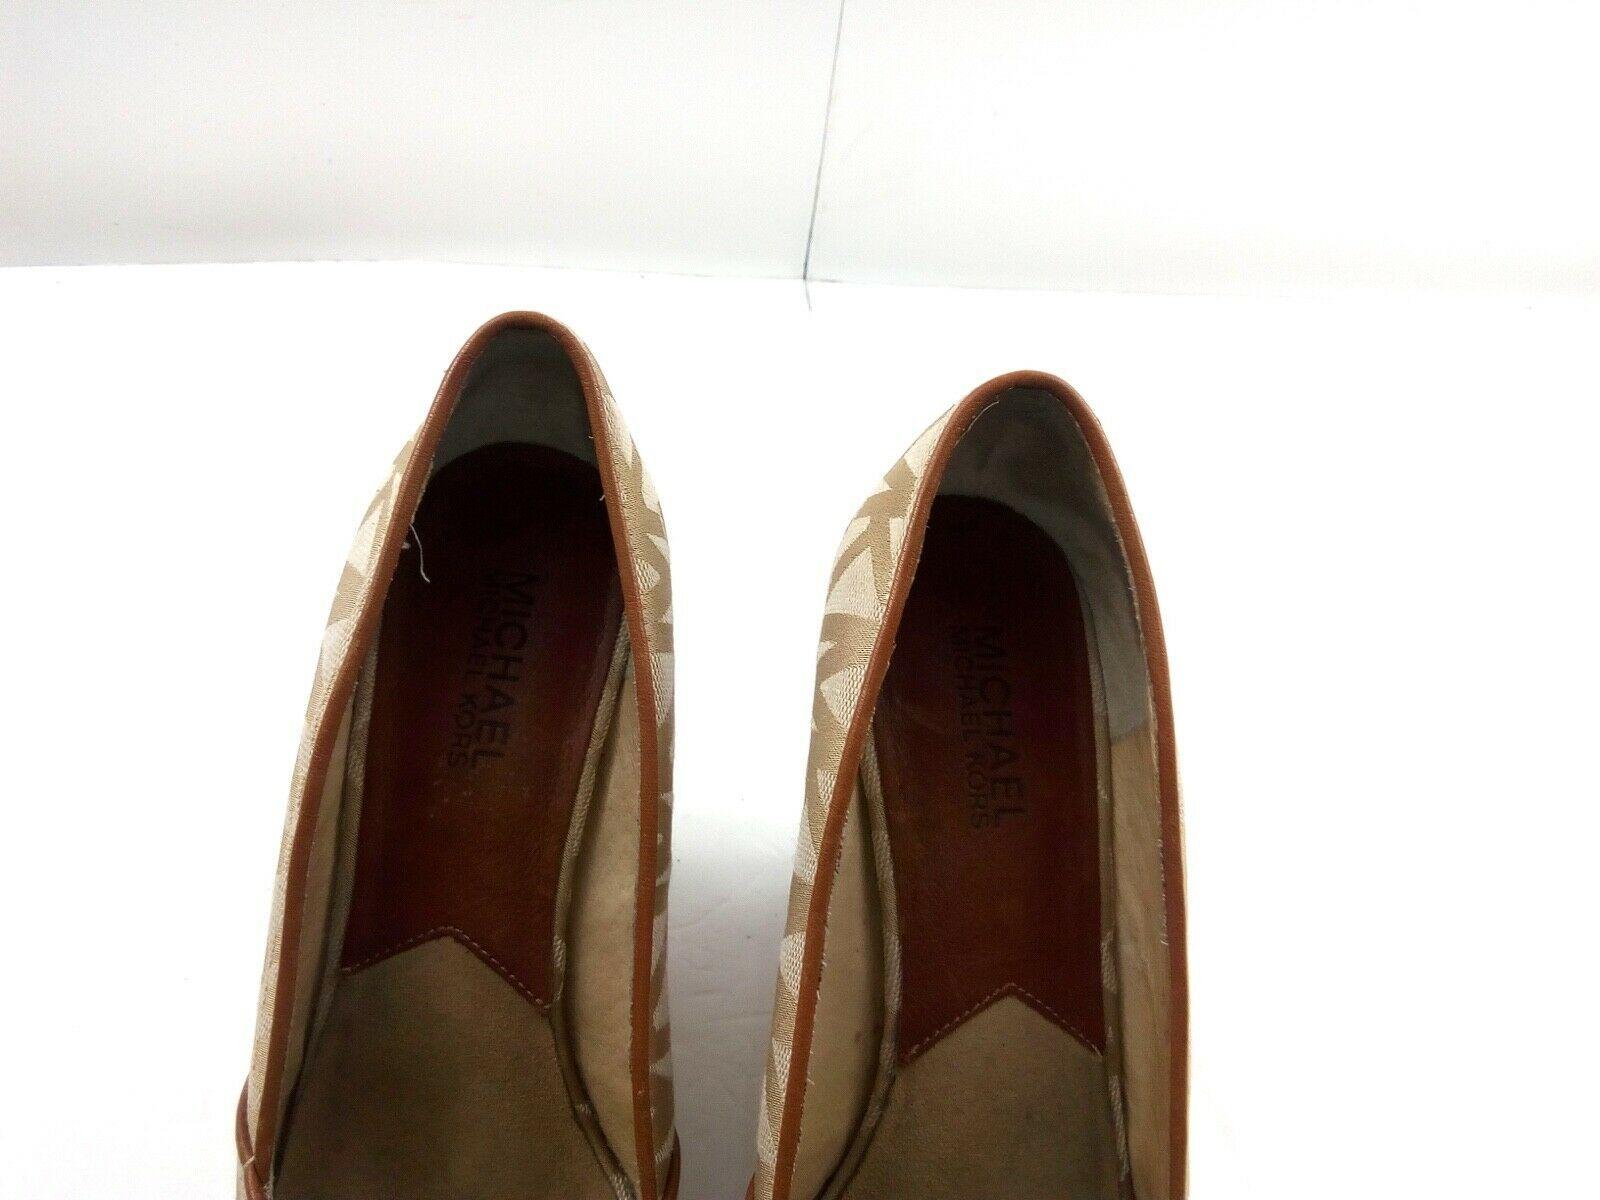 MICHAEL KORS Womens Wedges 7.5 Tan Cabana Peep Toe Platform Espadrilles $144 image 9